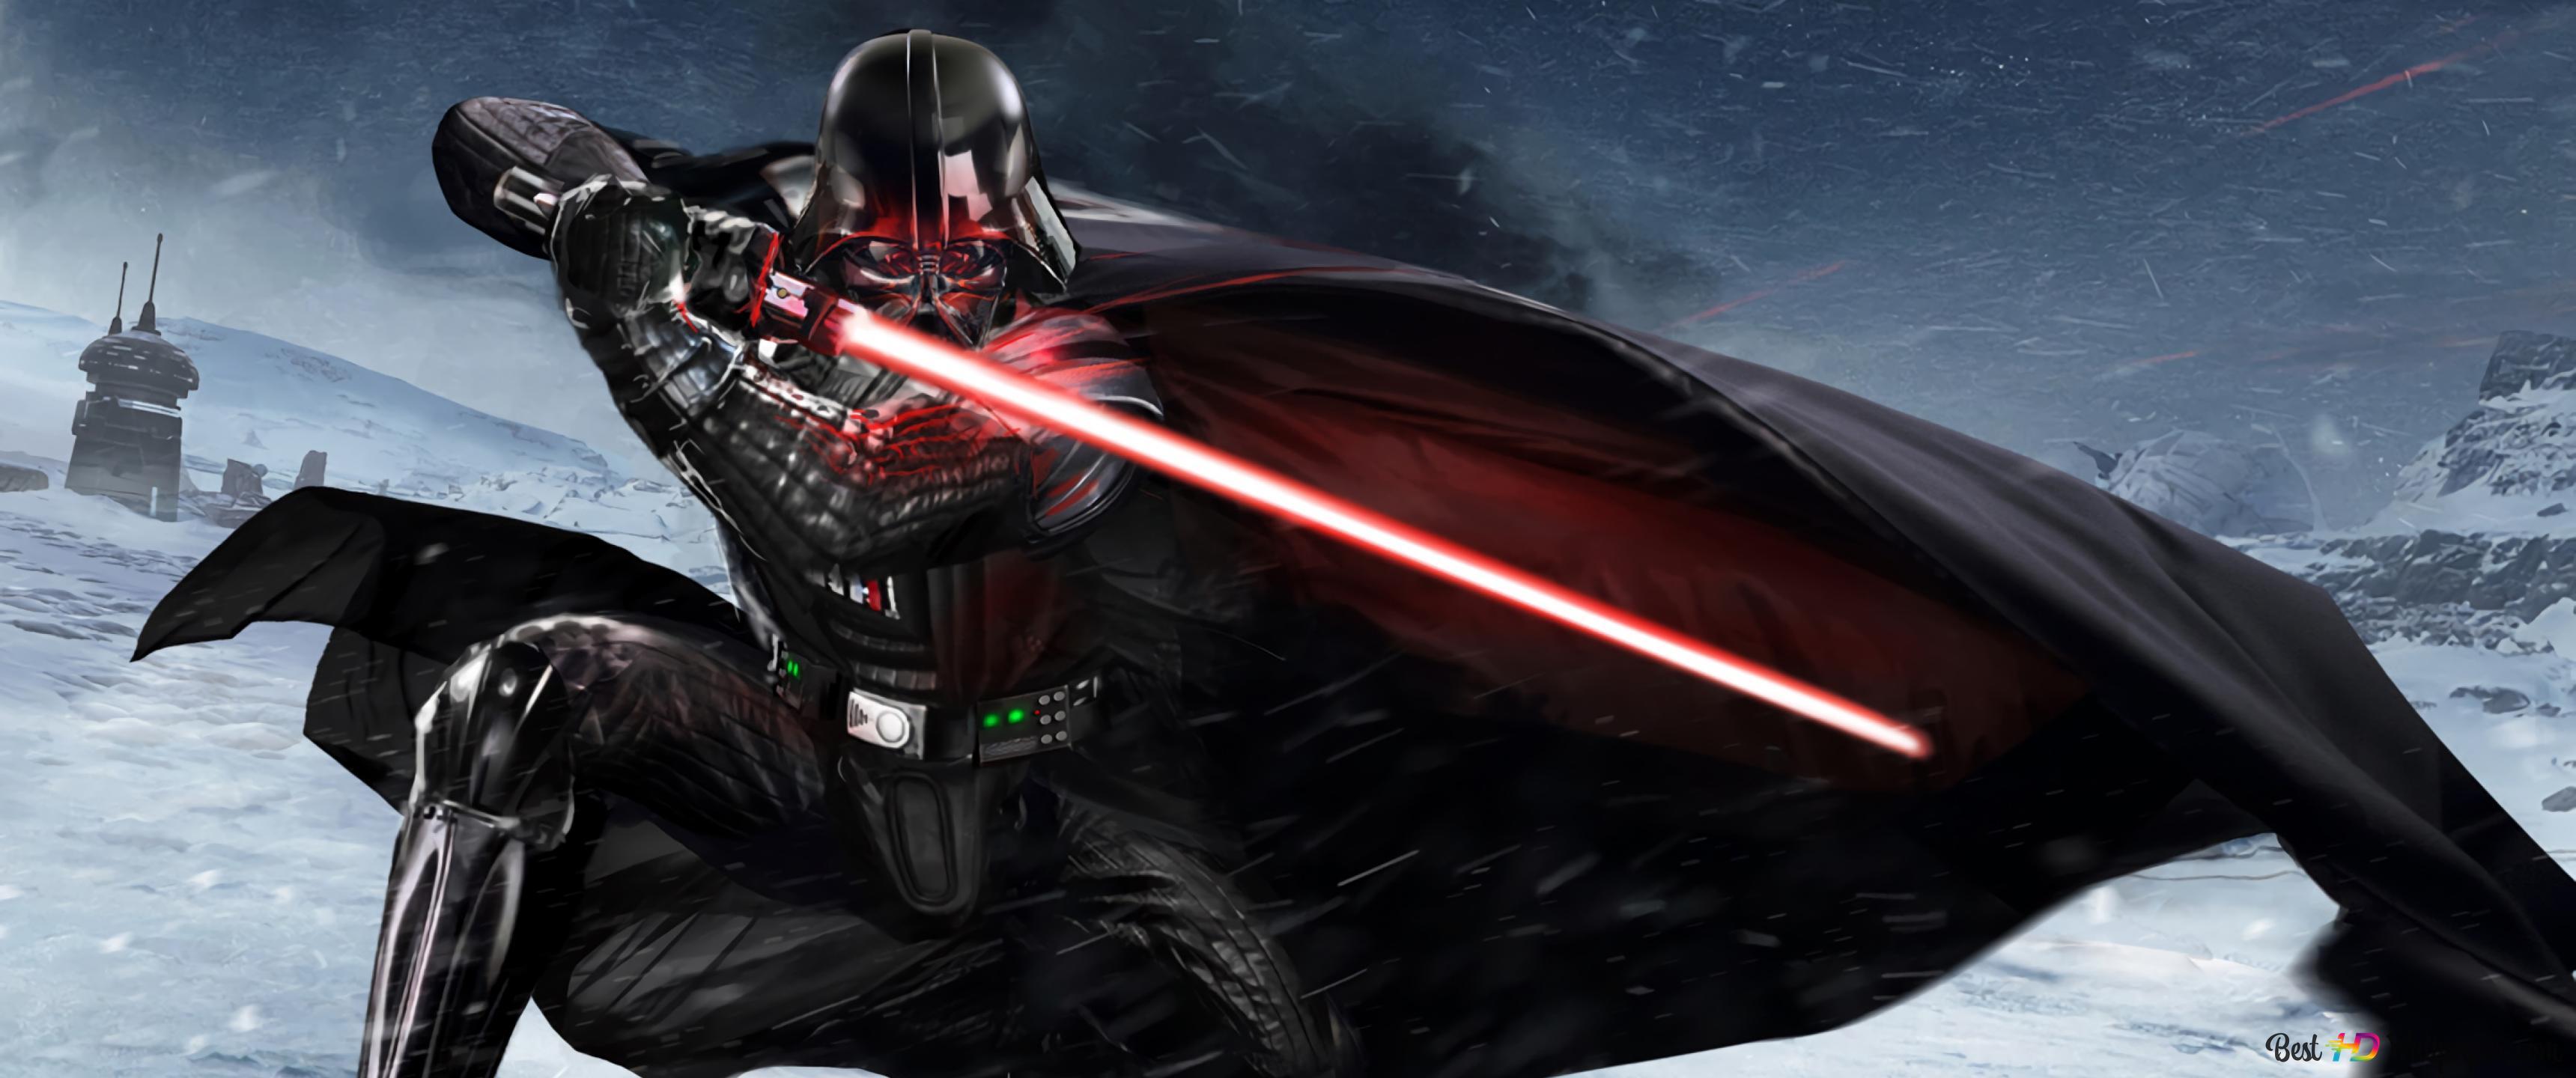 Star Wars Movie Shadow Stormtrooper Hd Wallpaper Download